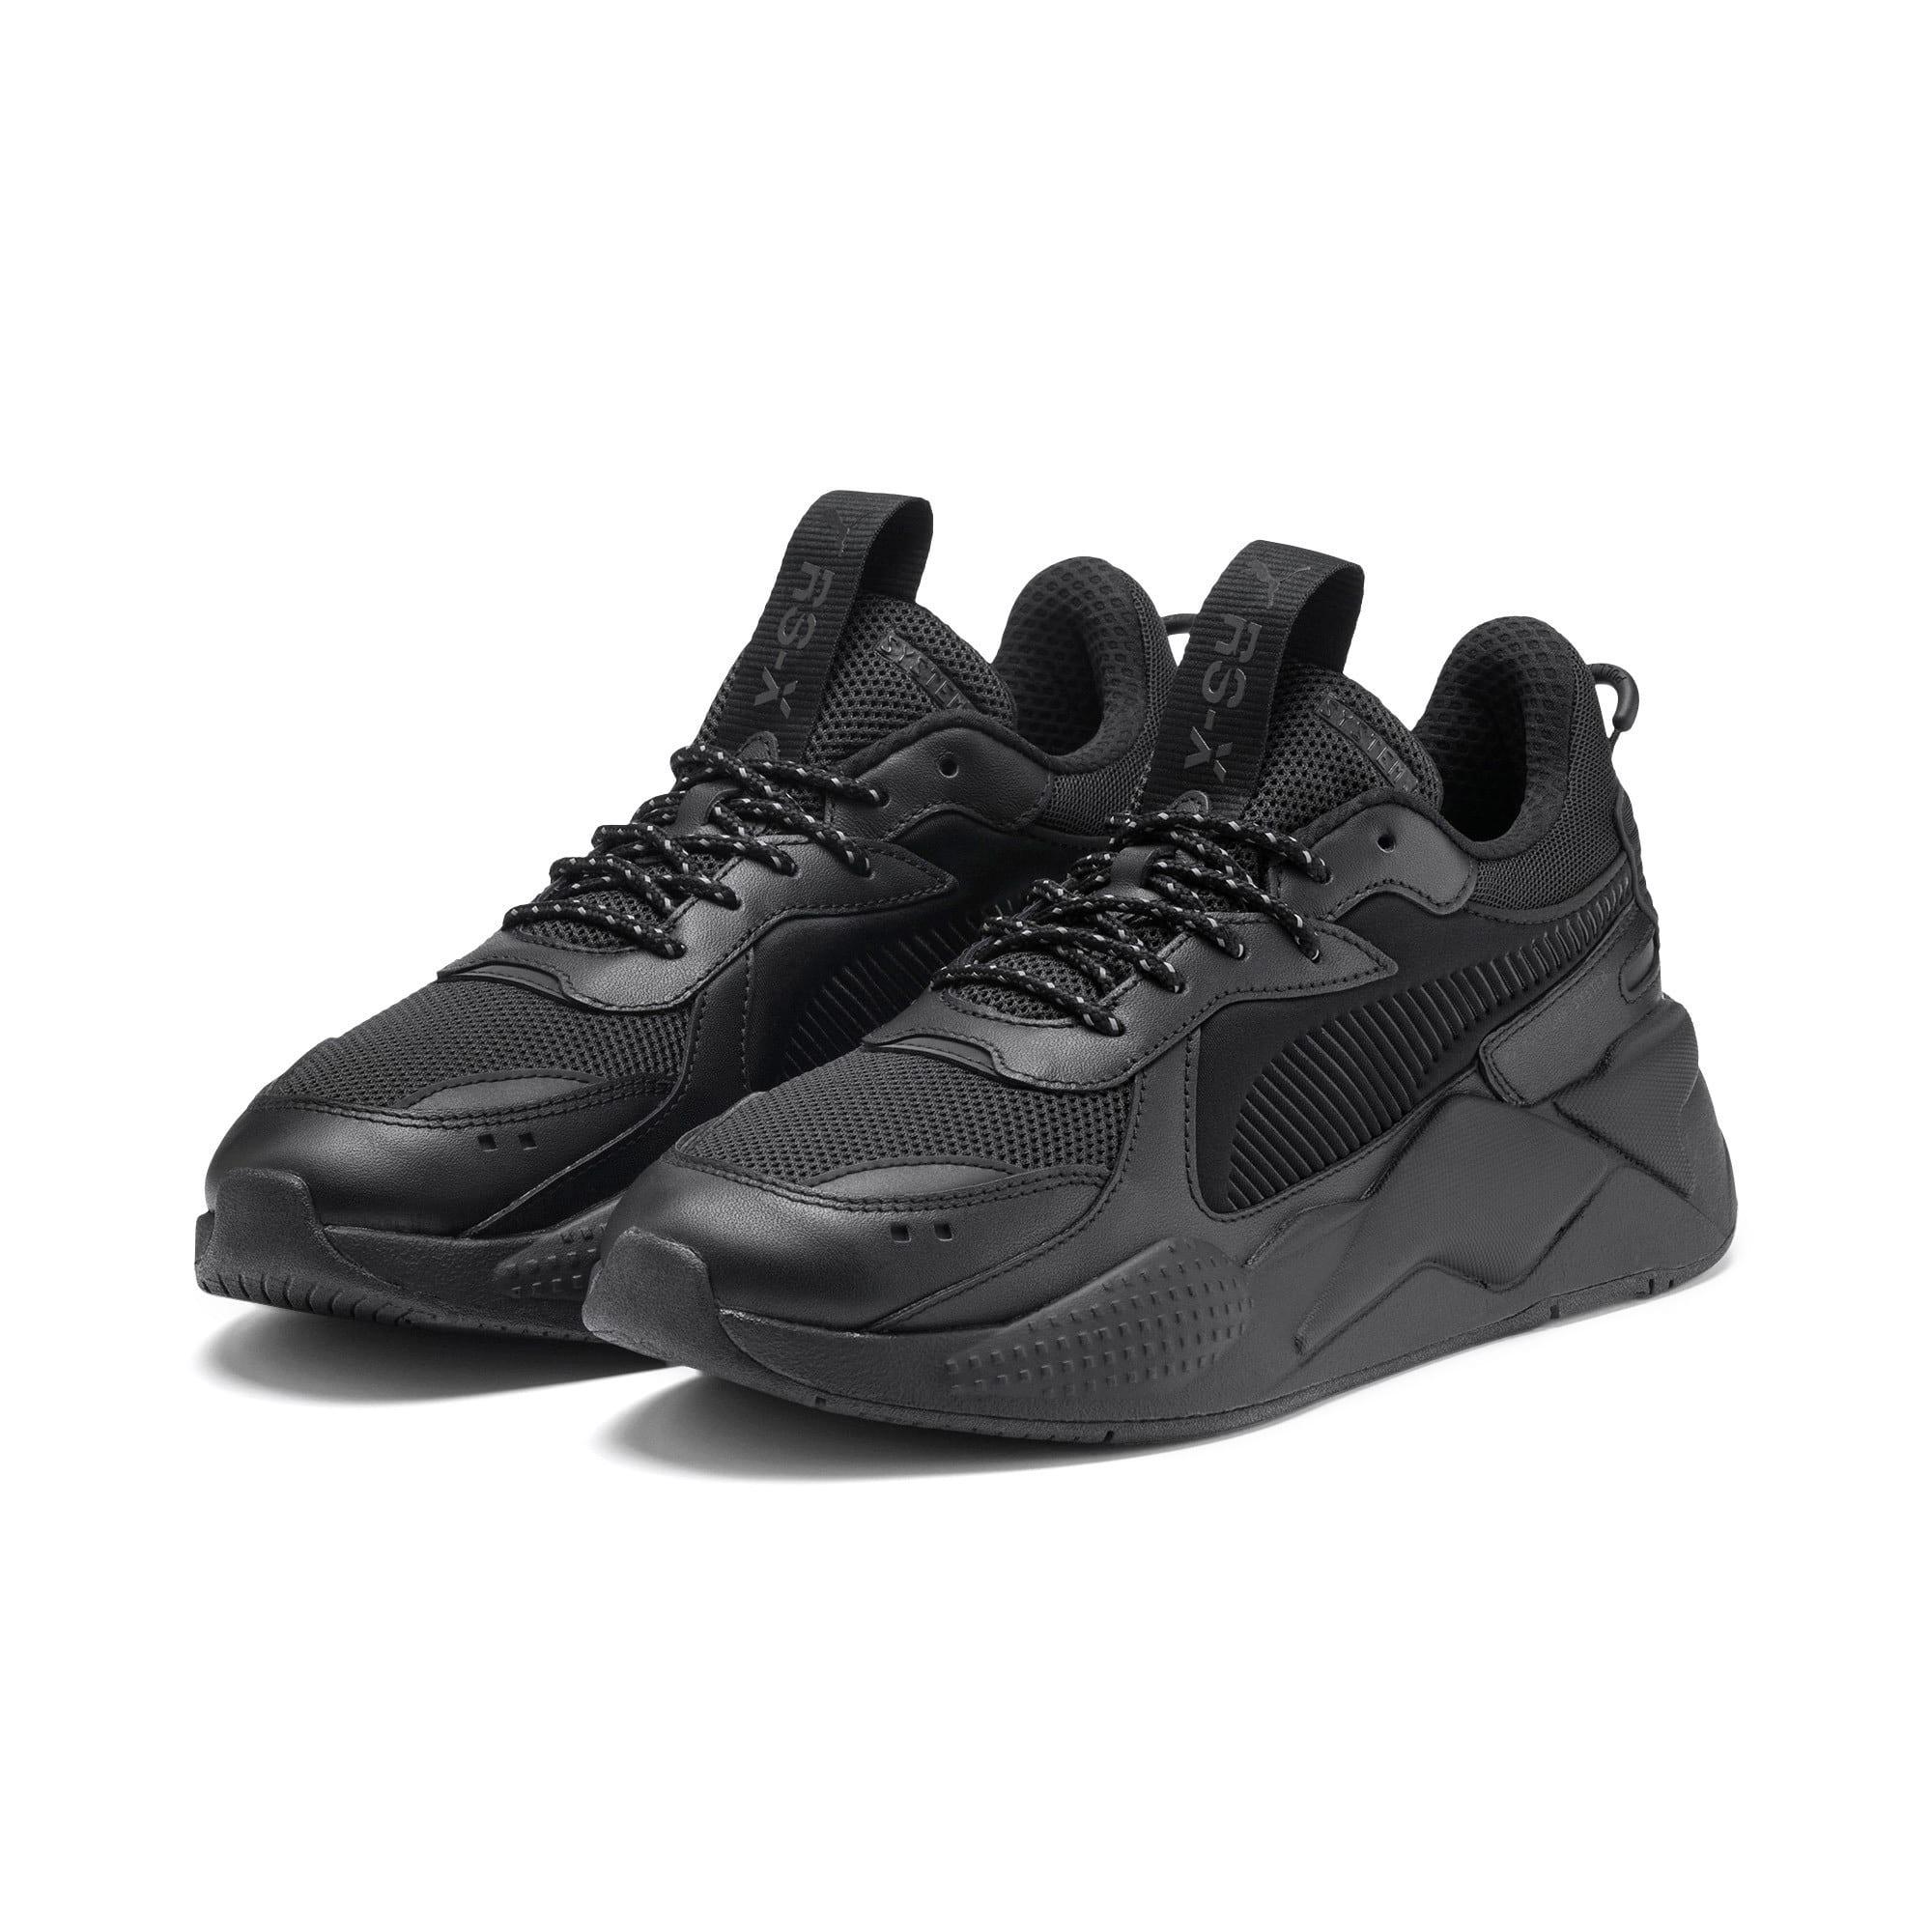 Thumbnail 2 of RS-X Trainers, Puma Black-Puma Black, medium